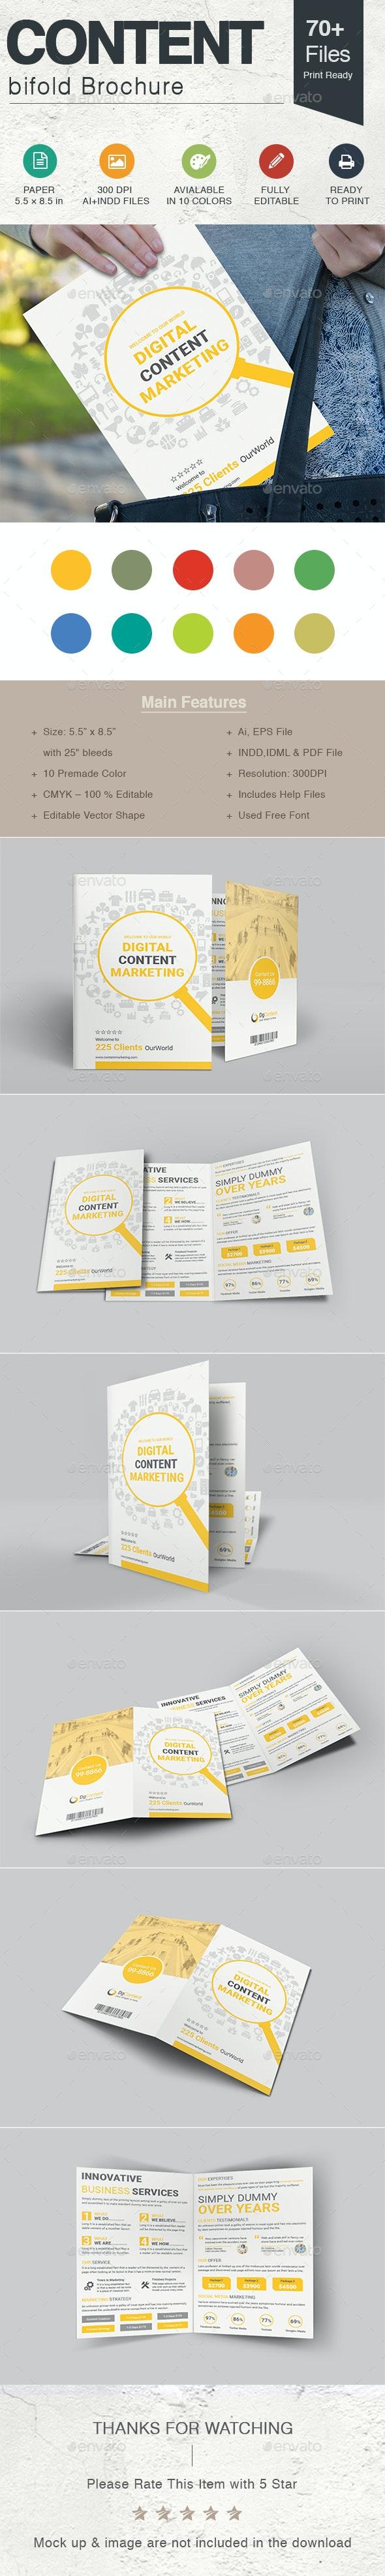 Content Marketing Bi-fold Brochure - Corporate Brochures